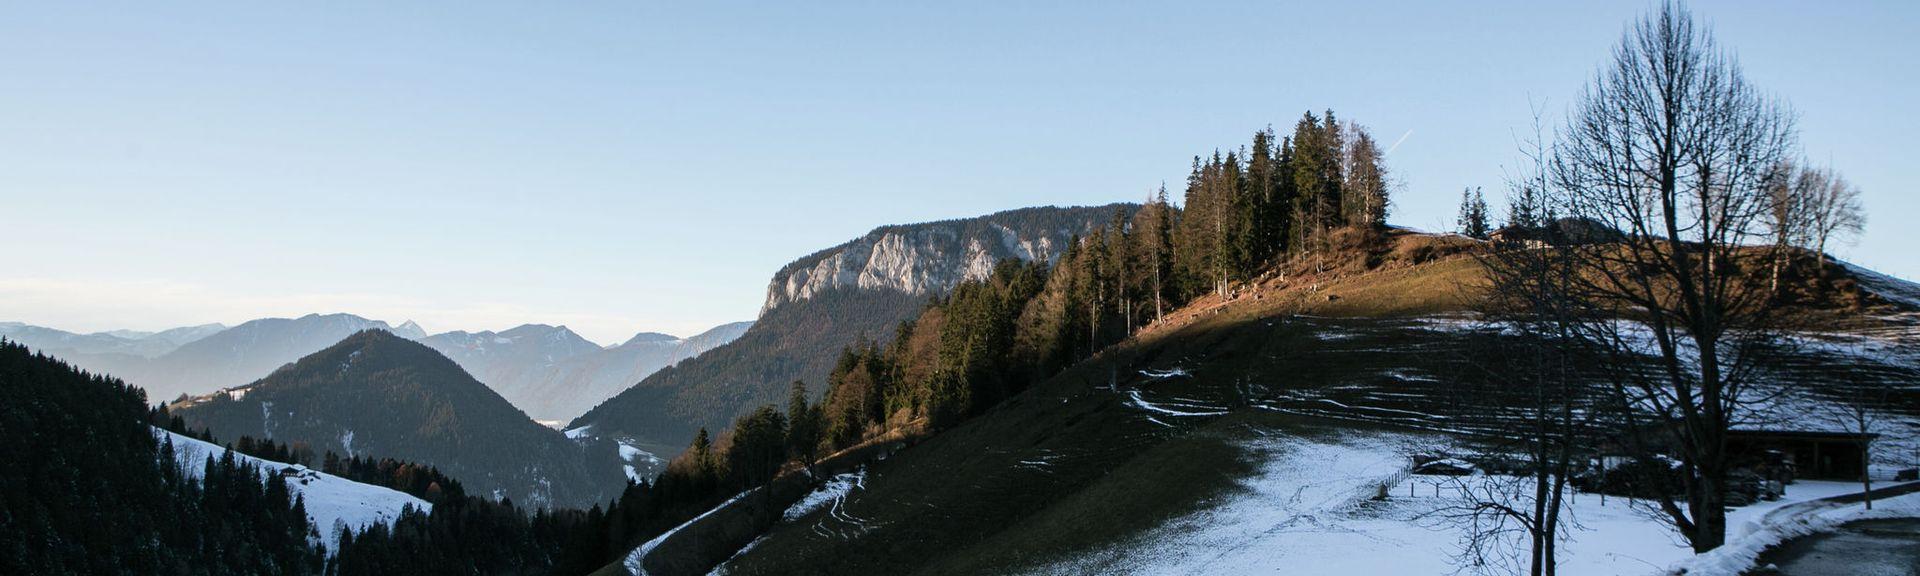 Hexenwasser, Söll, Tirol, Oostenrijk